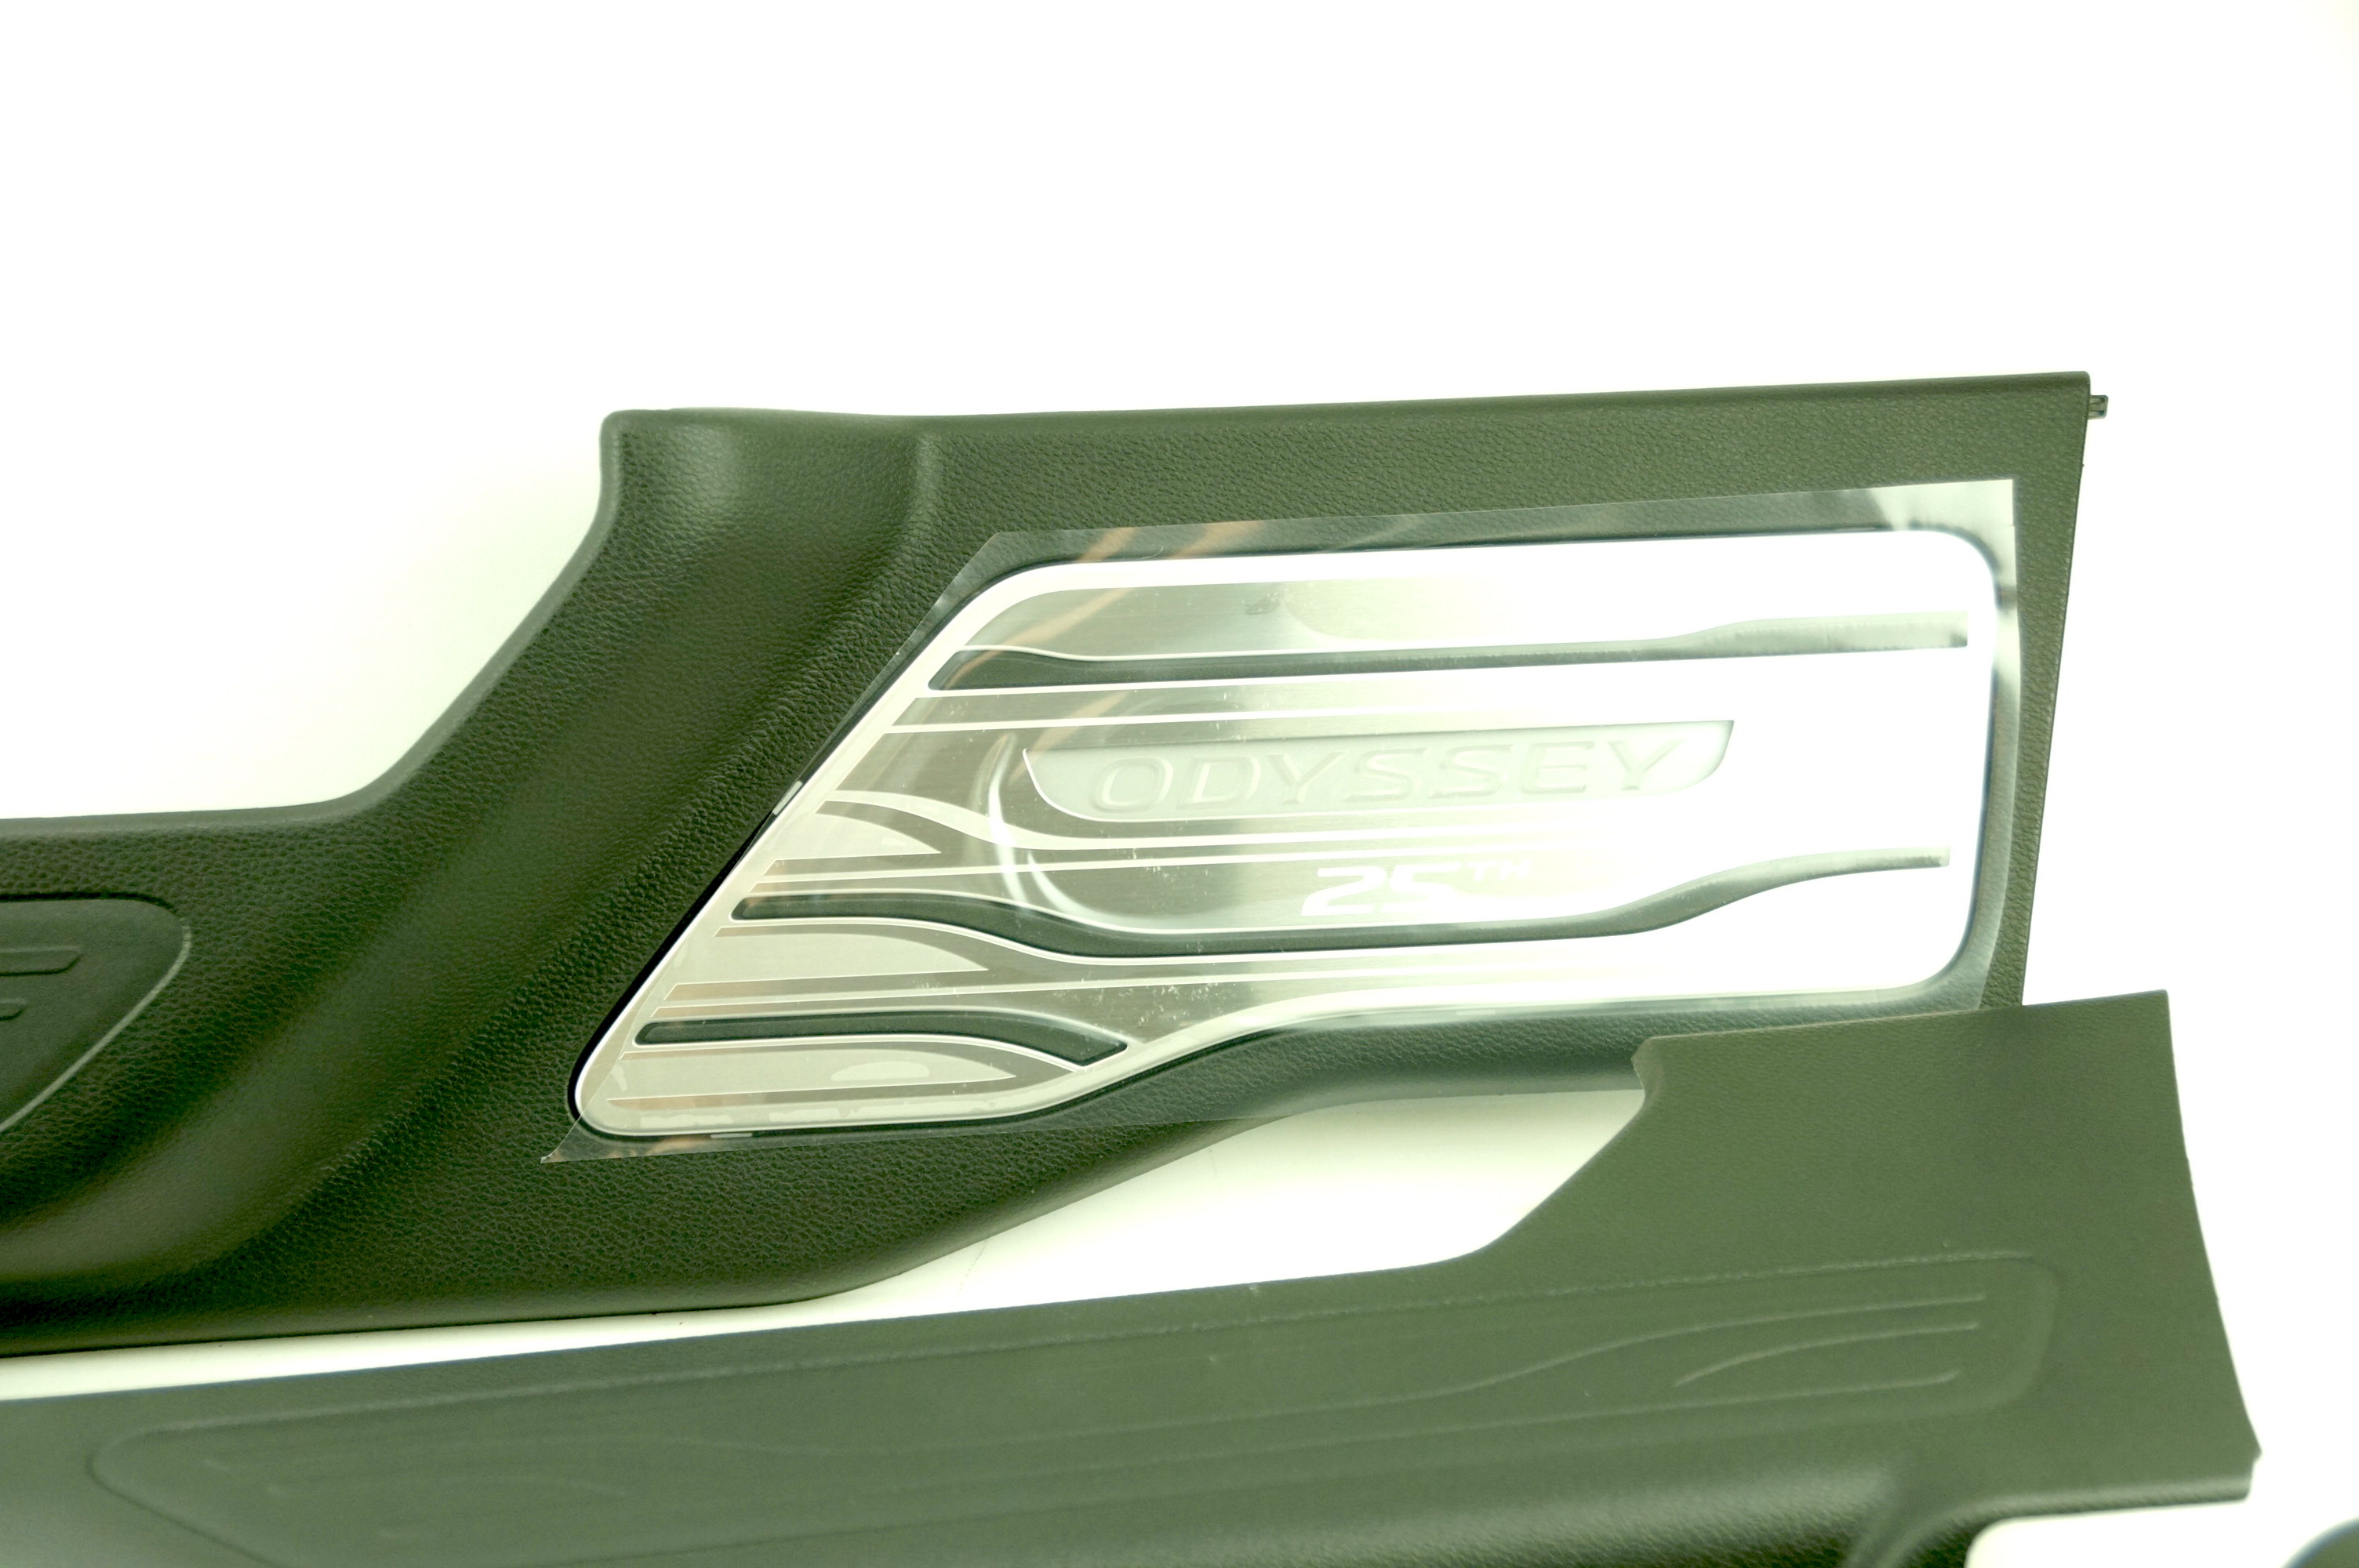 OEM 08E12THR100B Genuine Honda Odyssey 25th Anniversary Illuminated Door Sill - image 9